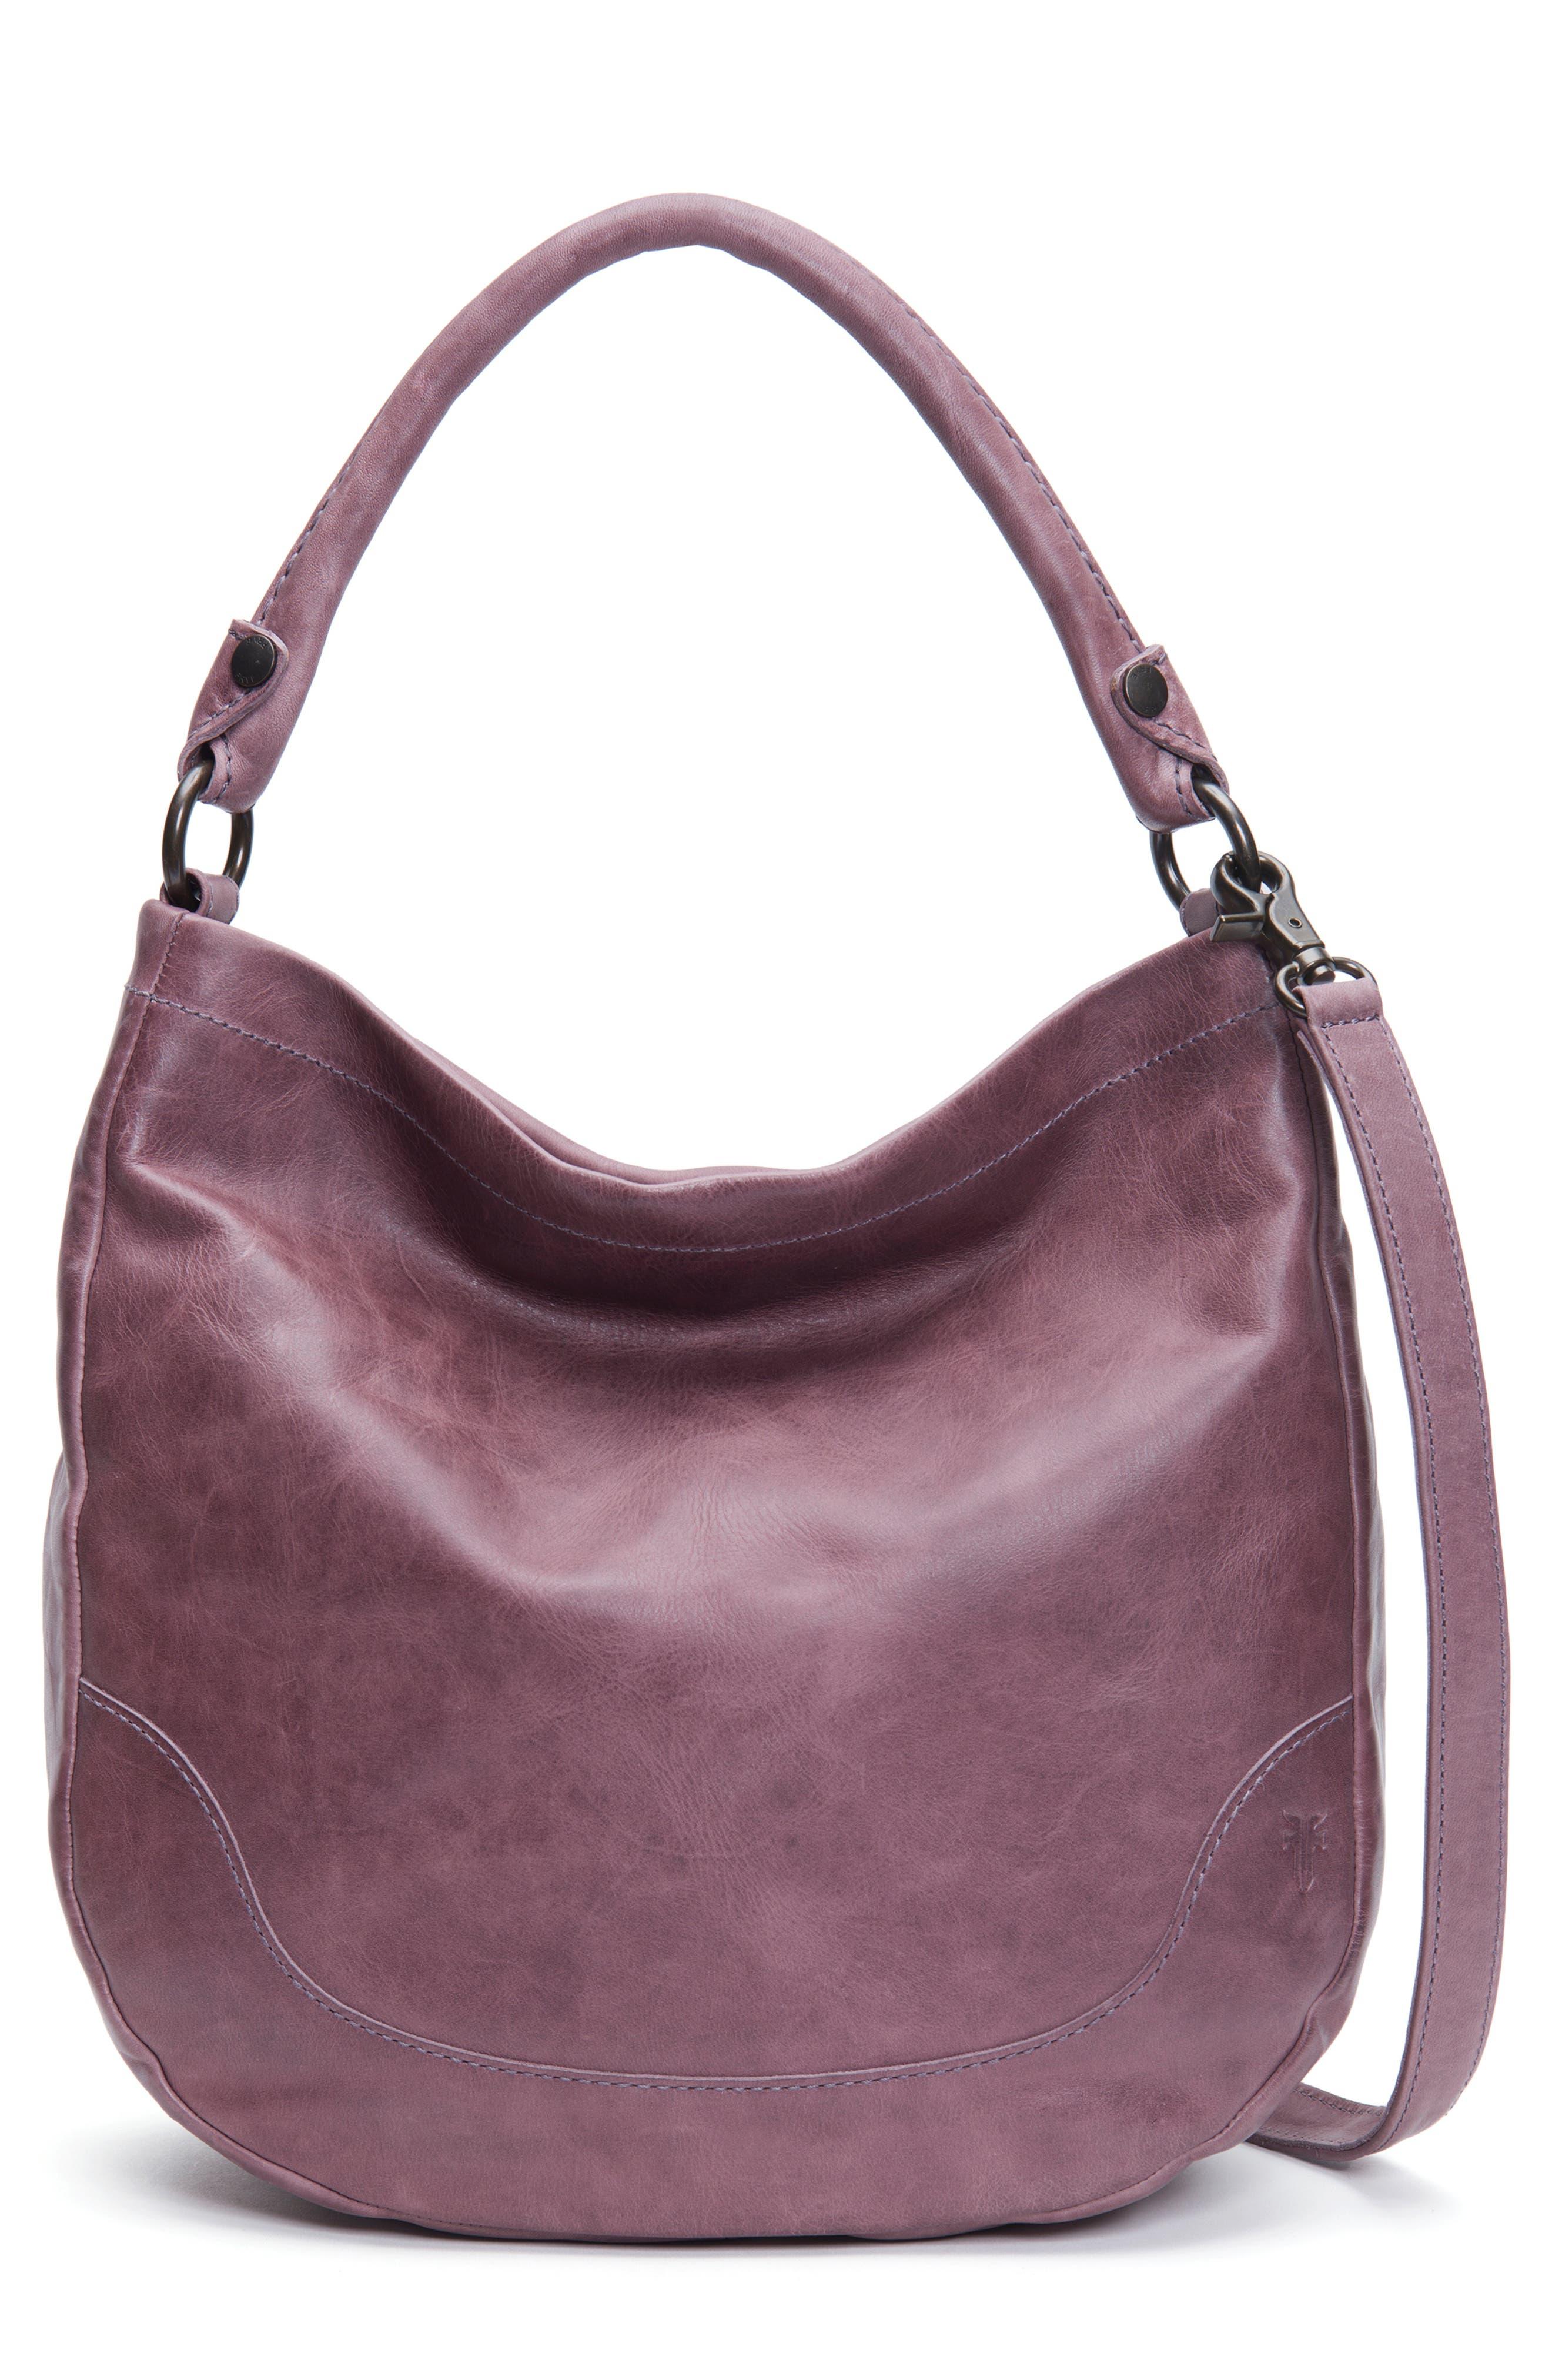 3c81d08455ab Hobo Bags   Purses